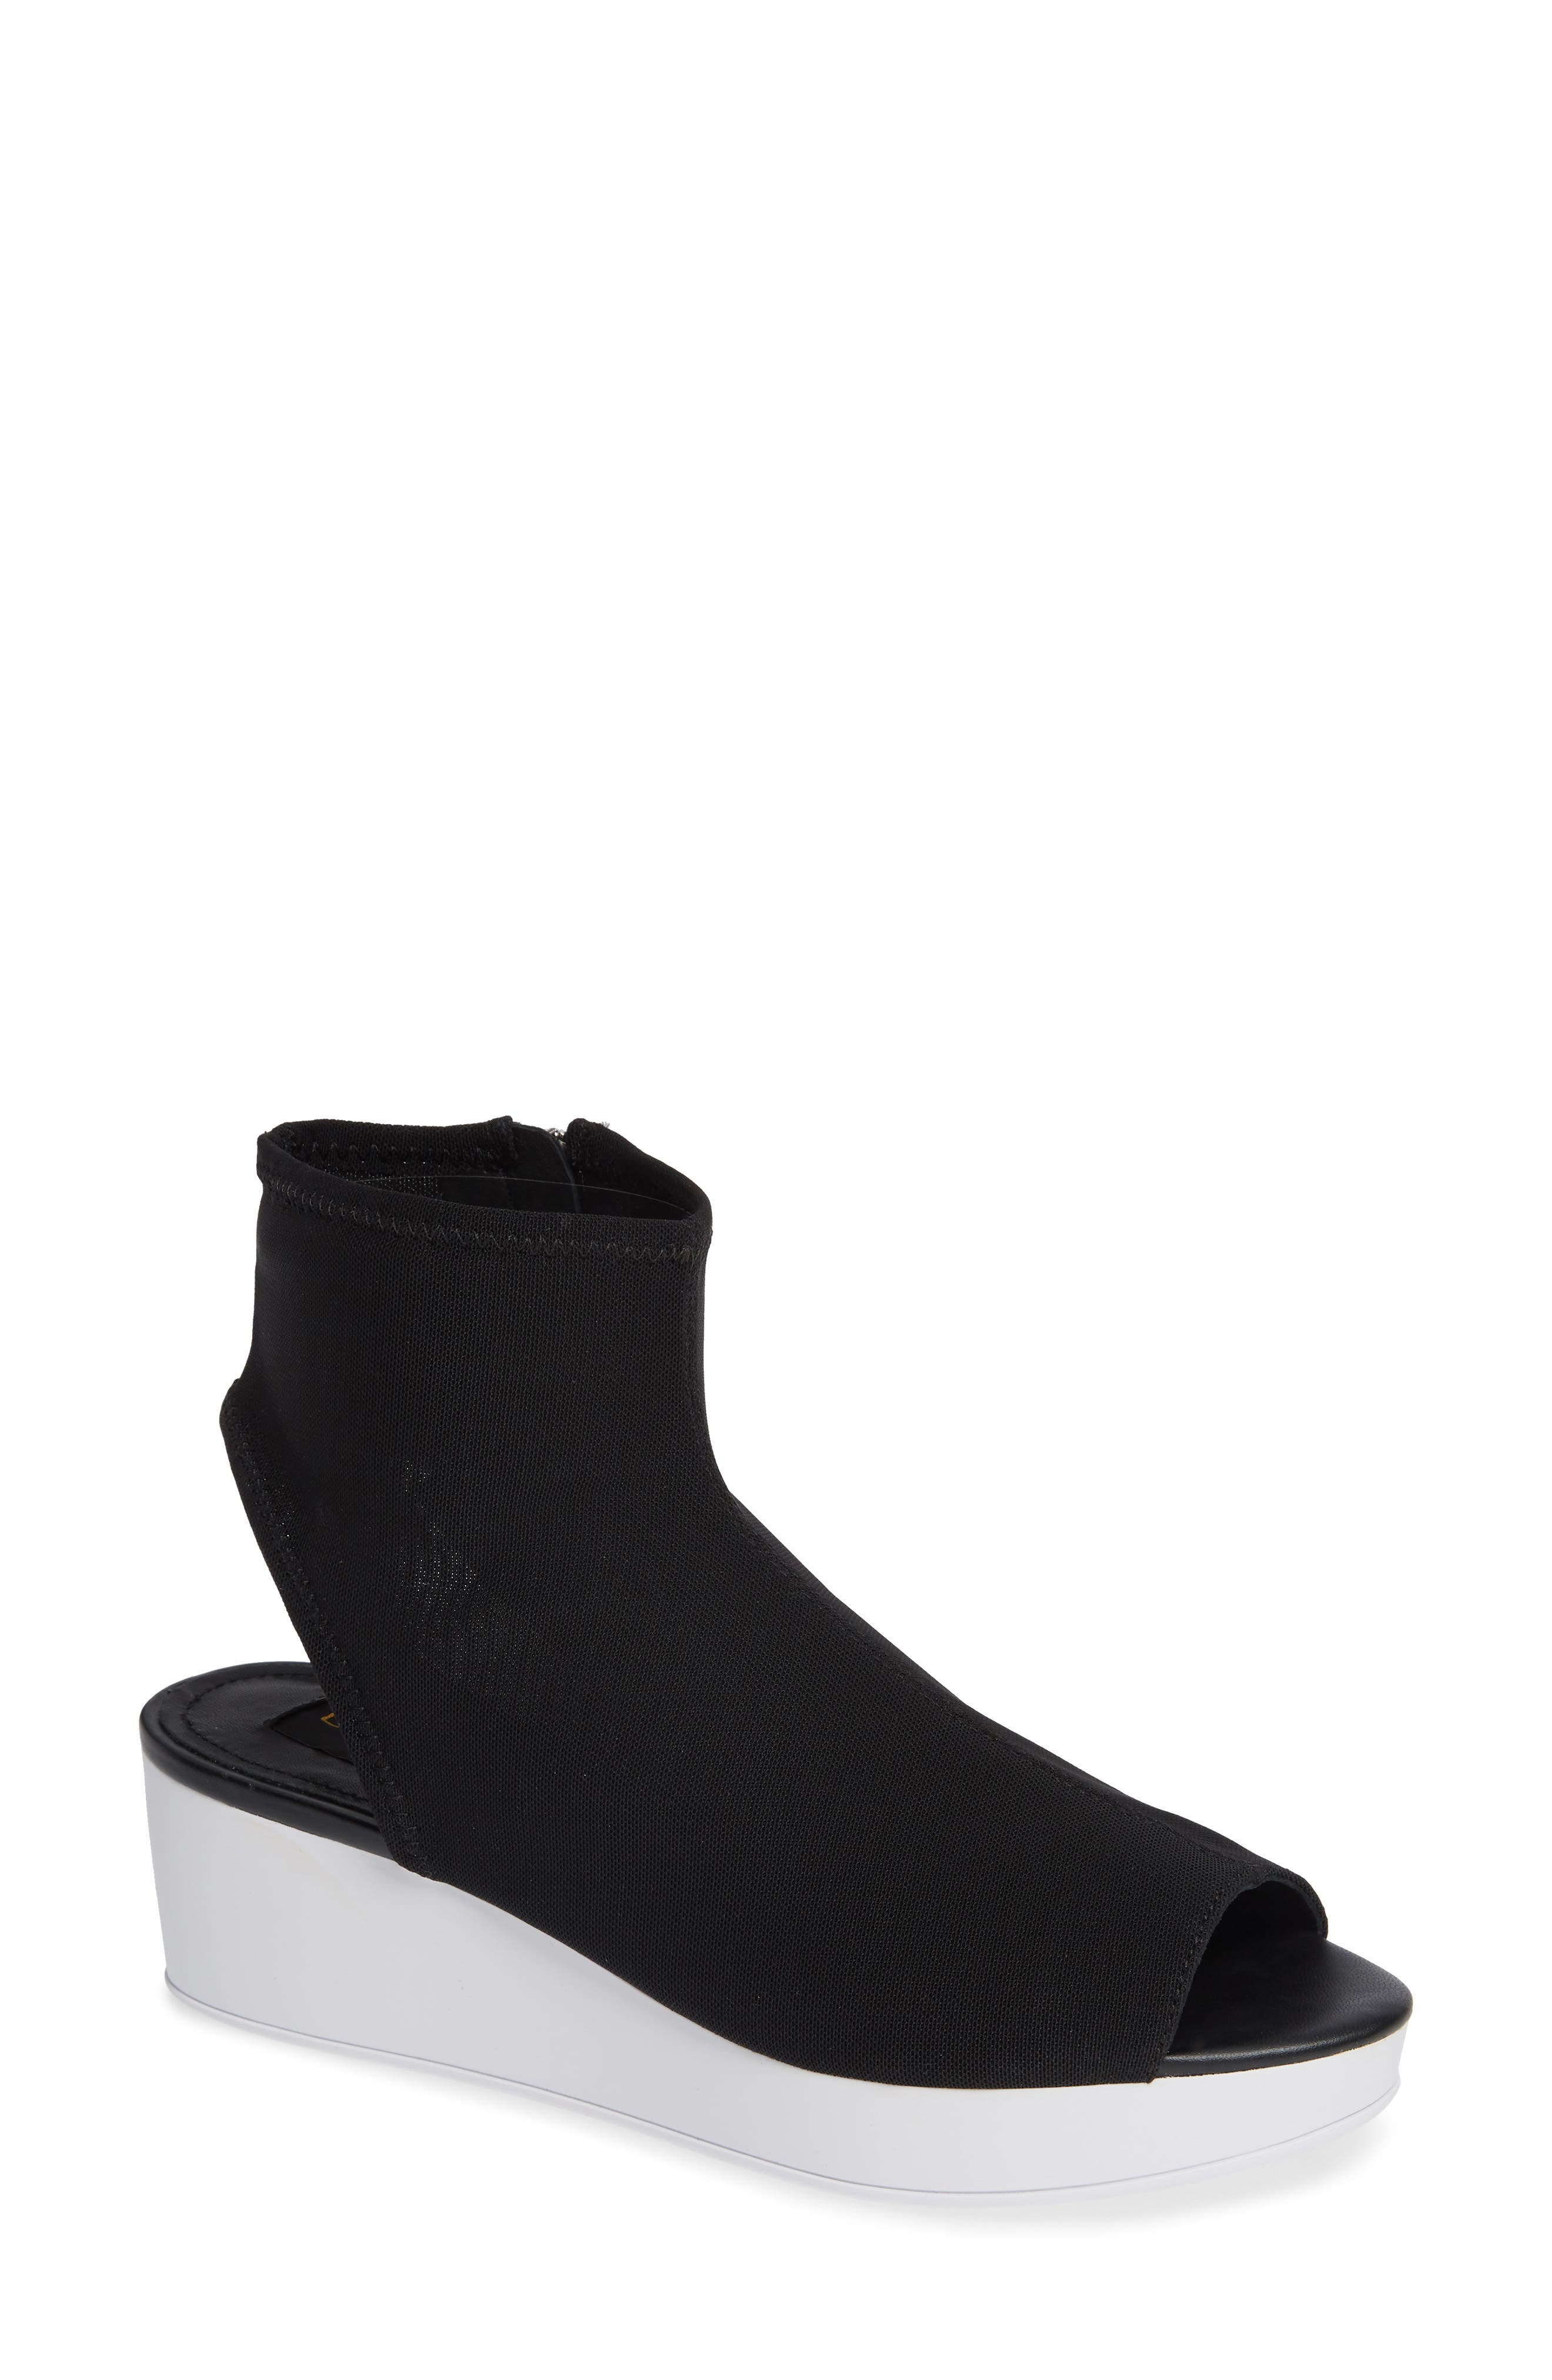 Donna Karan Rivera Mid-Wedge Sandal,                         Main,                         color, BLACK STRETCH FLY KNIT